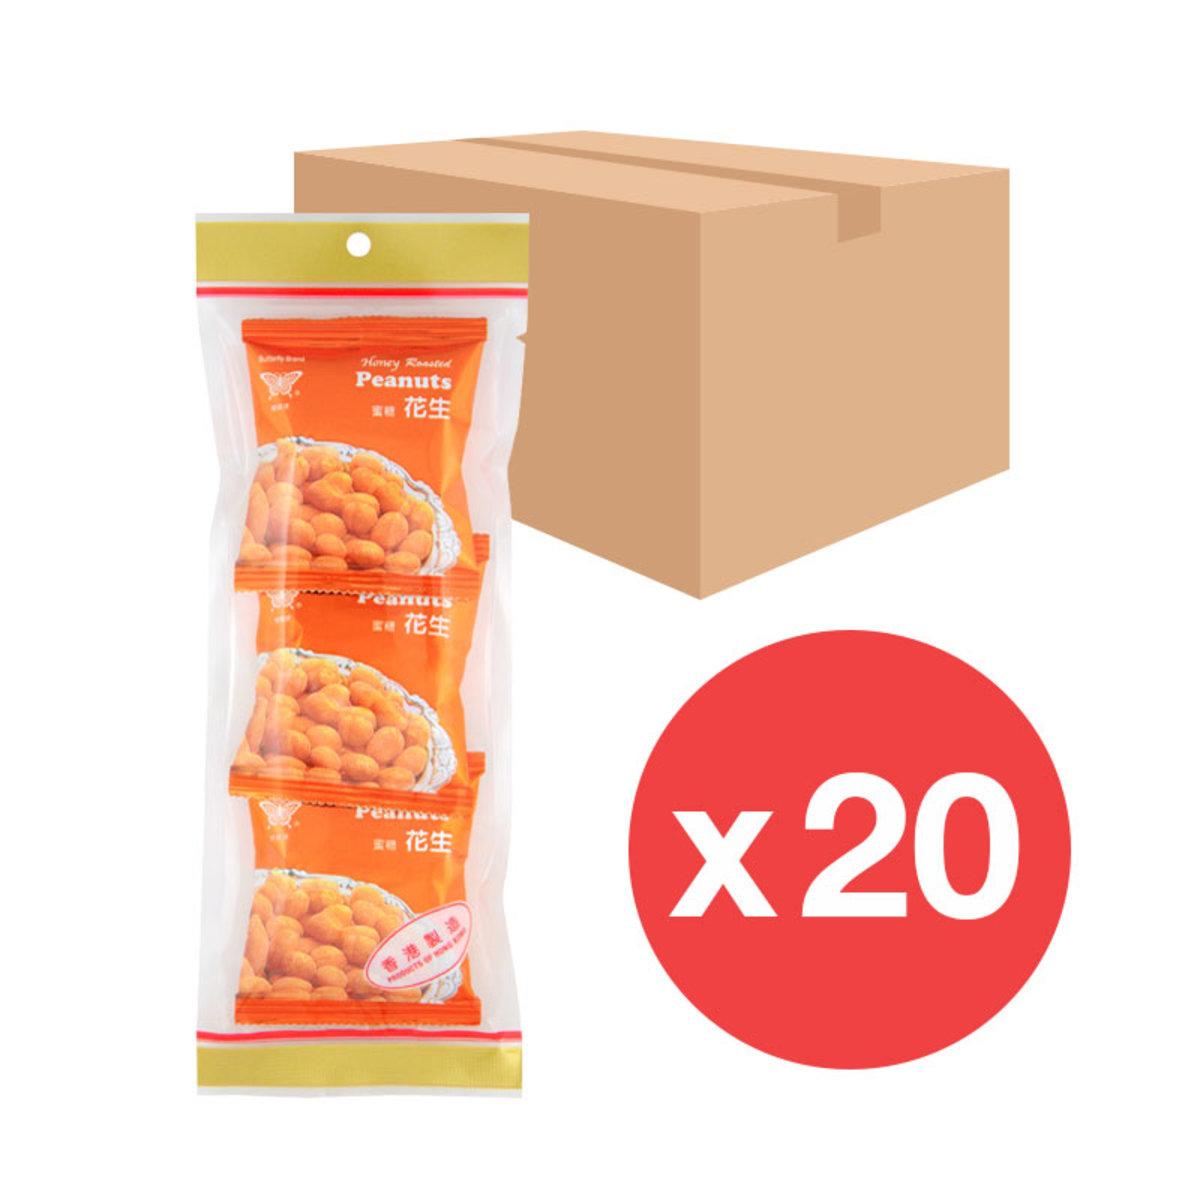 [Full case 20 bags] Honey Peanuts